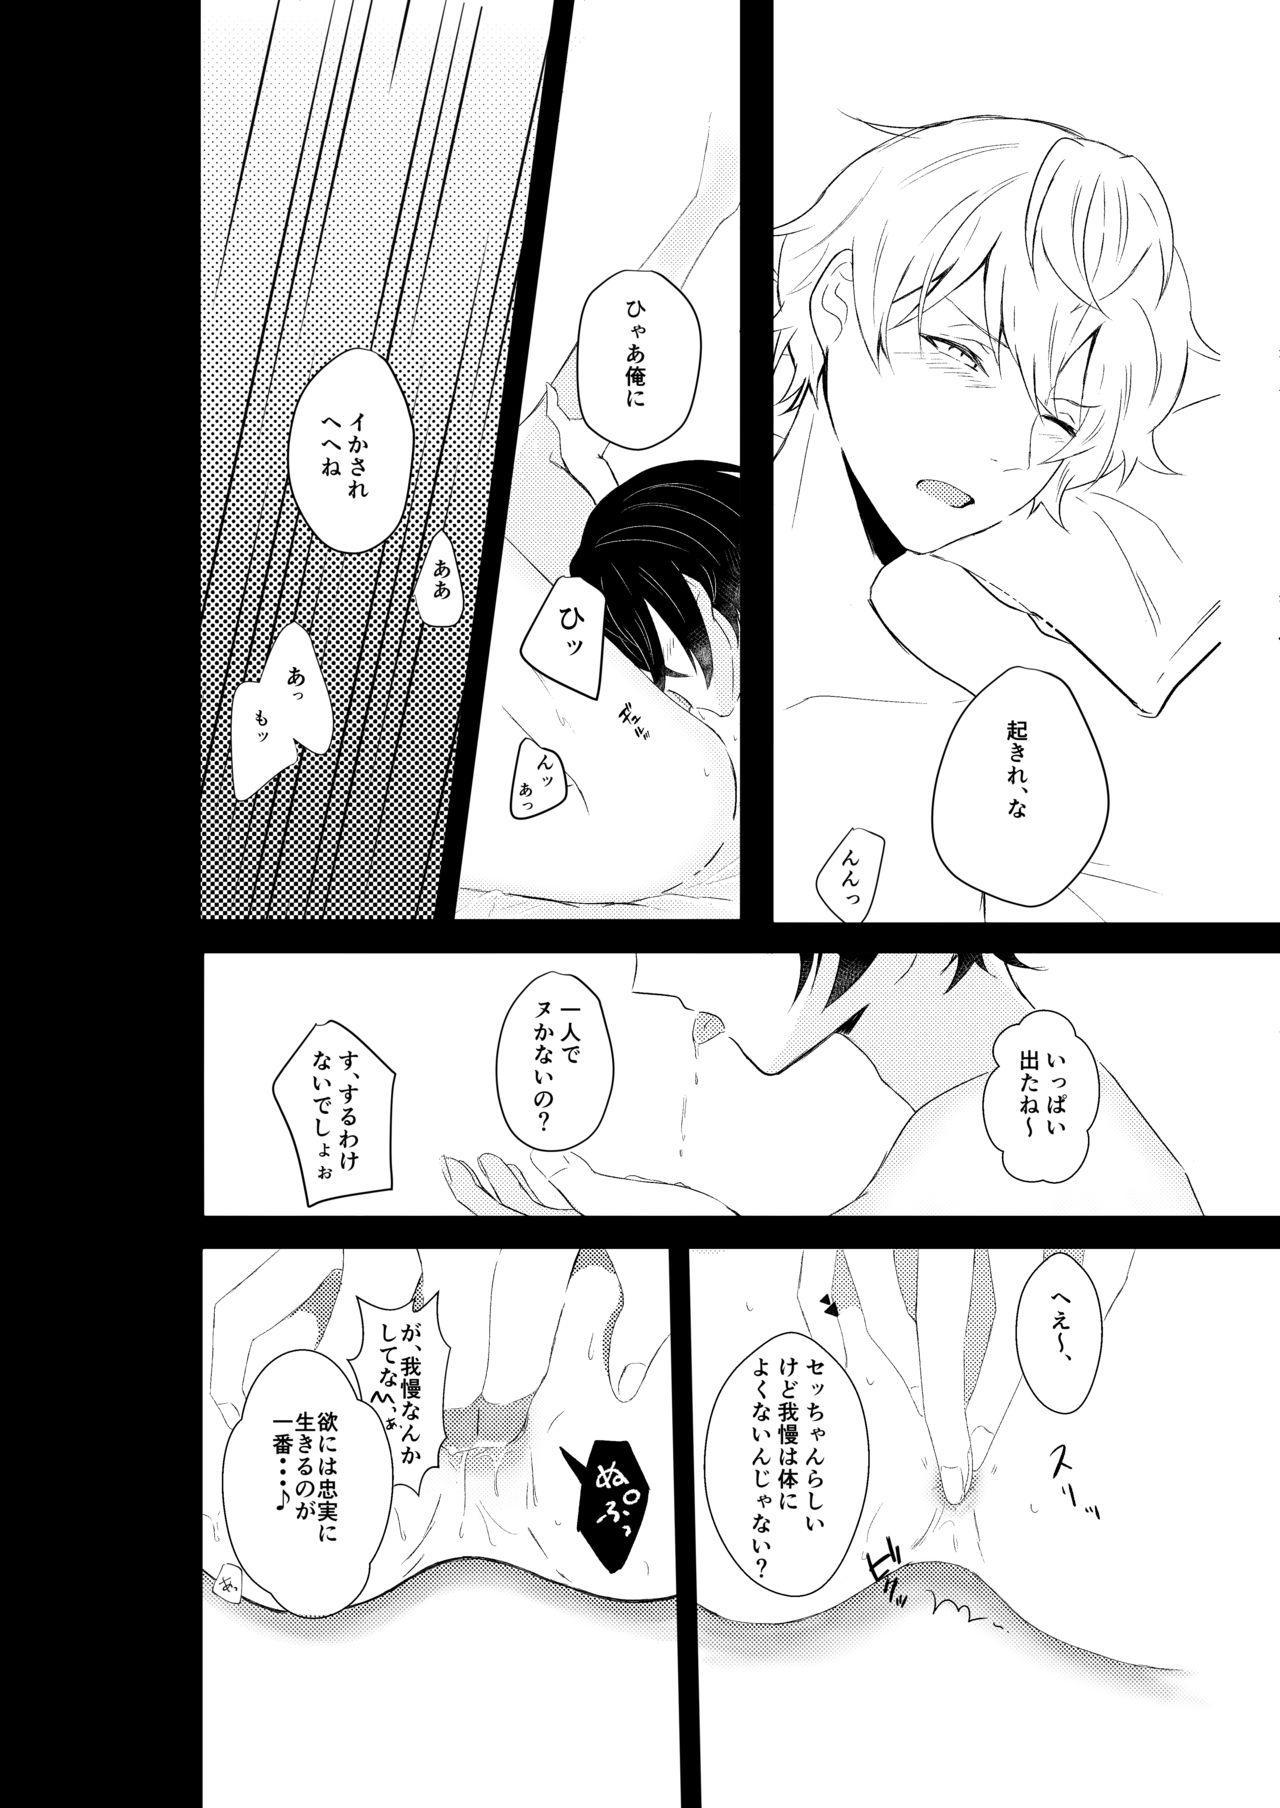 Midnight dream 10